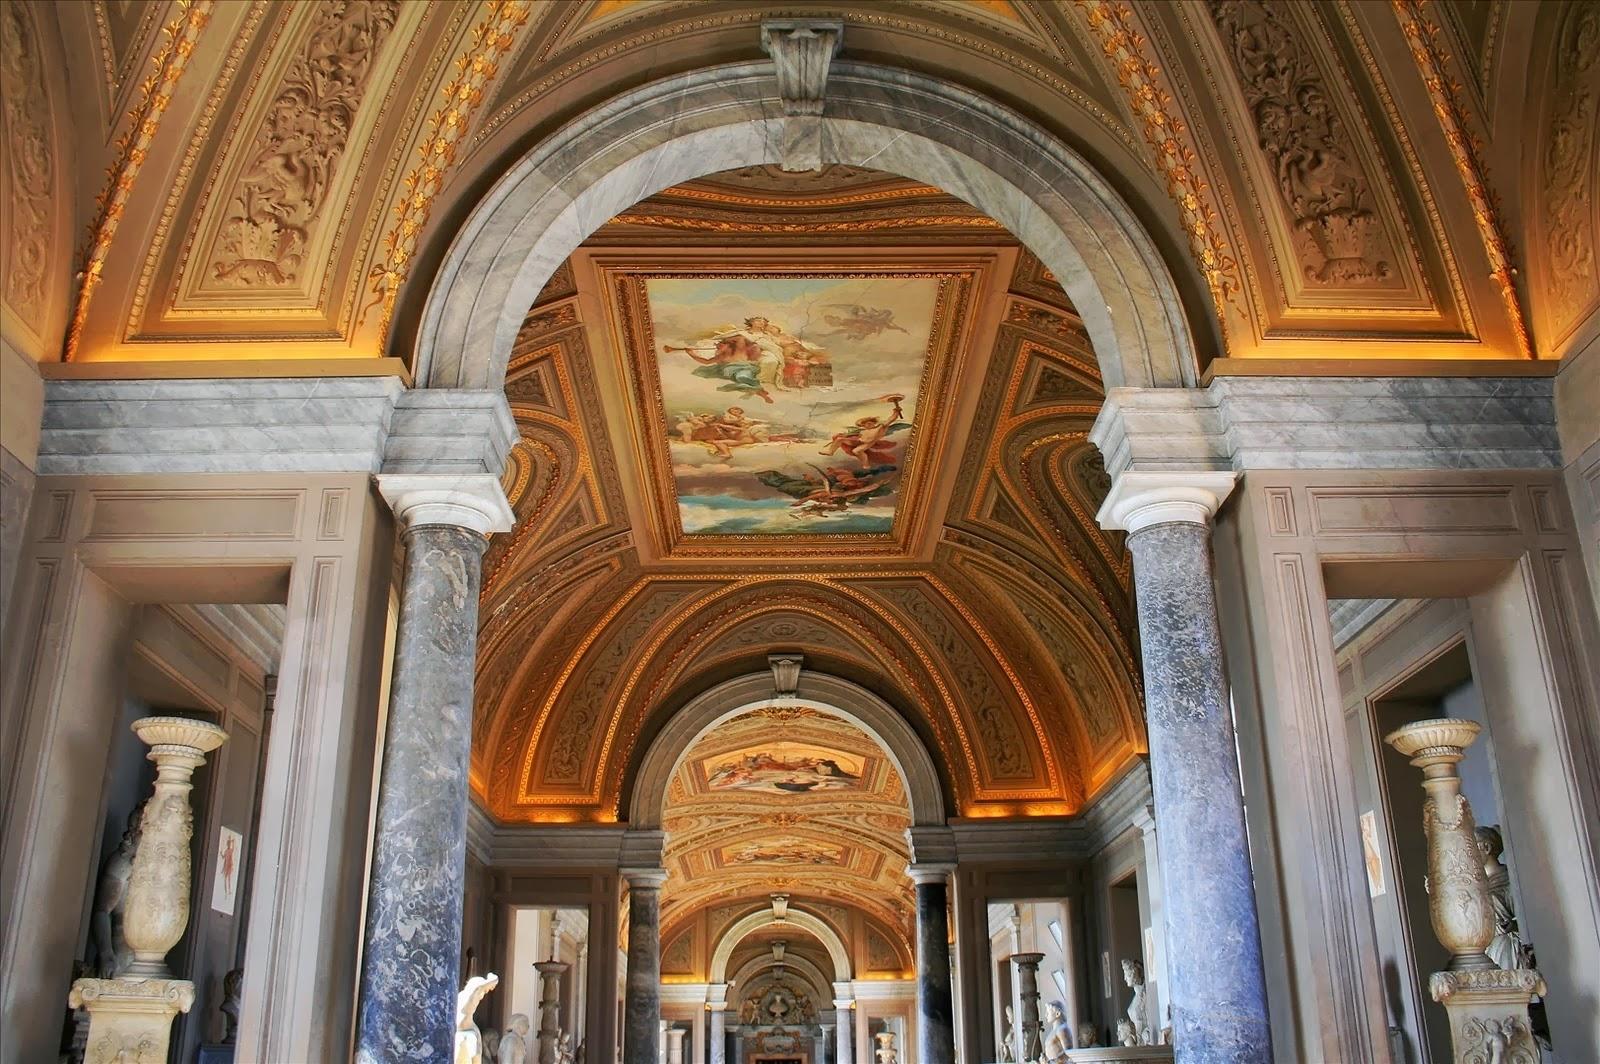 Roma, Musei Vaticani, Galleria dei Candelabri restaurata